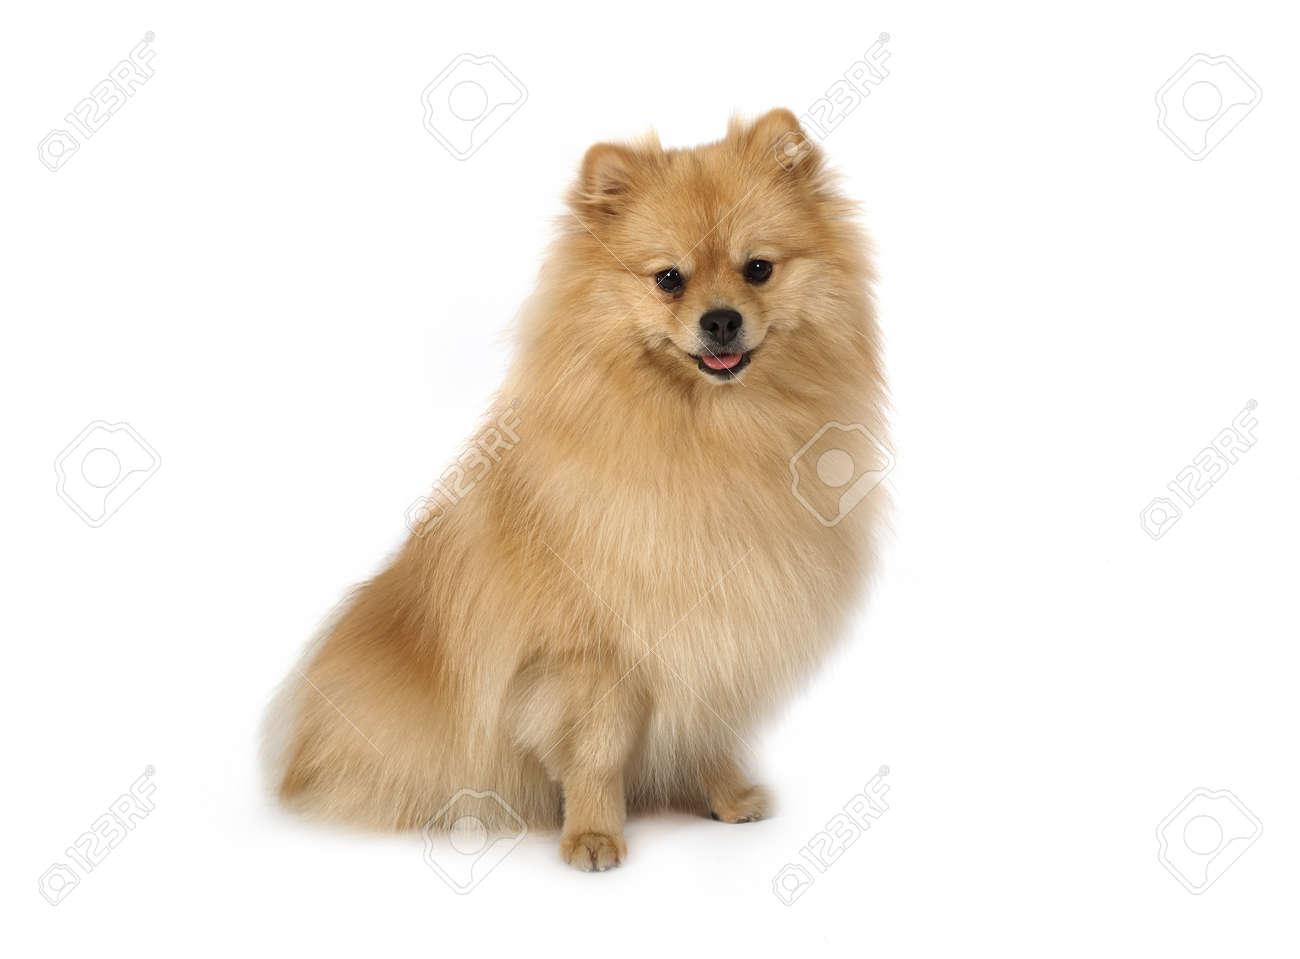 Studio Shot Of An Purebred Pomeranian Dog Sitting On White